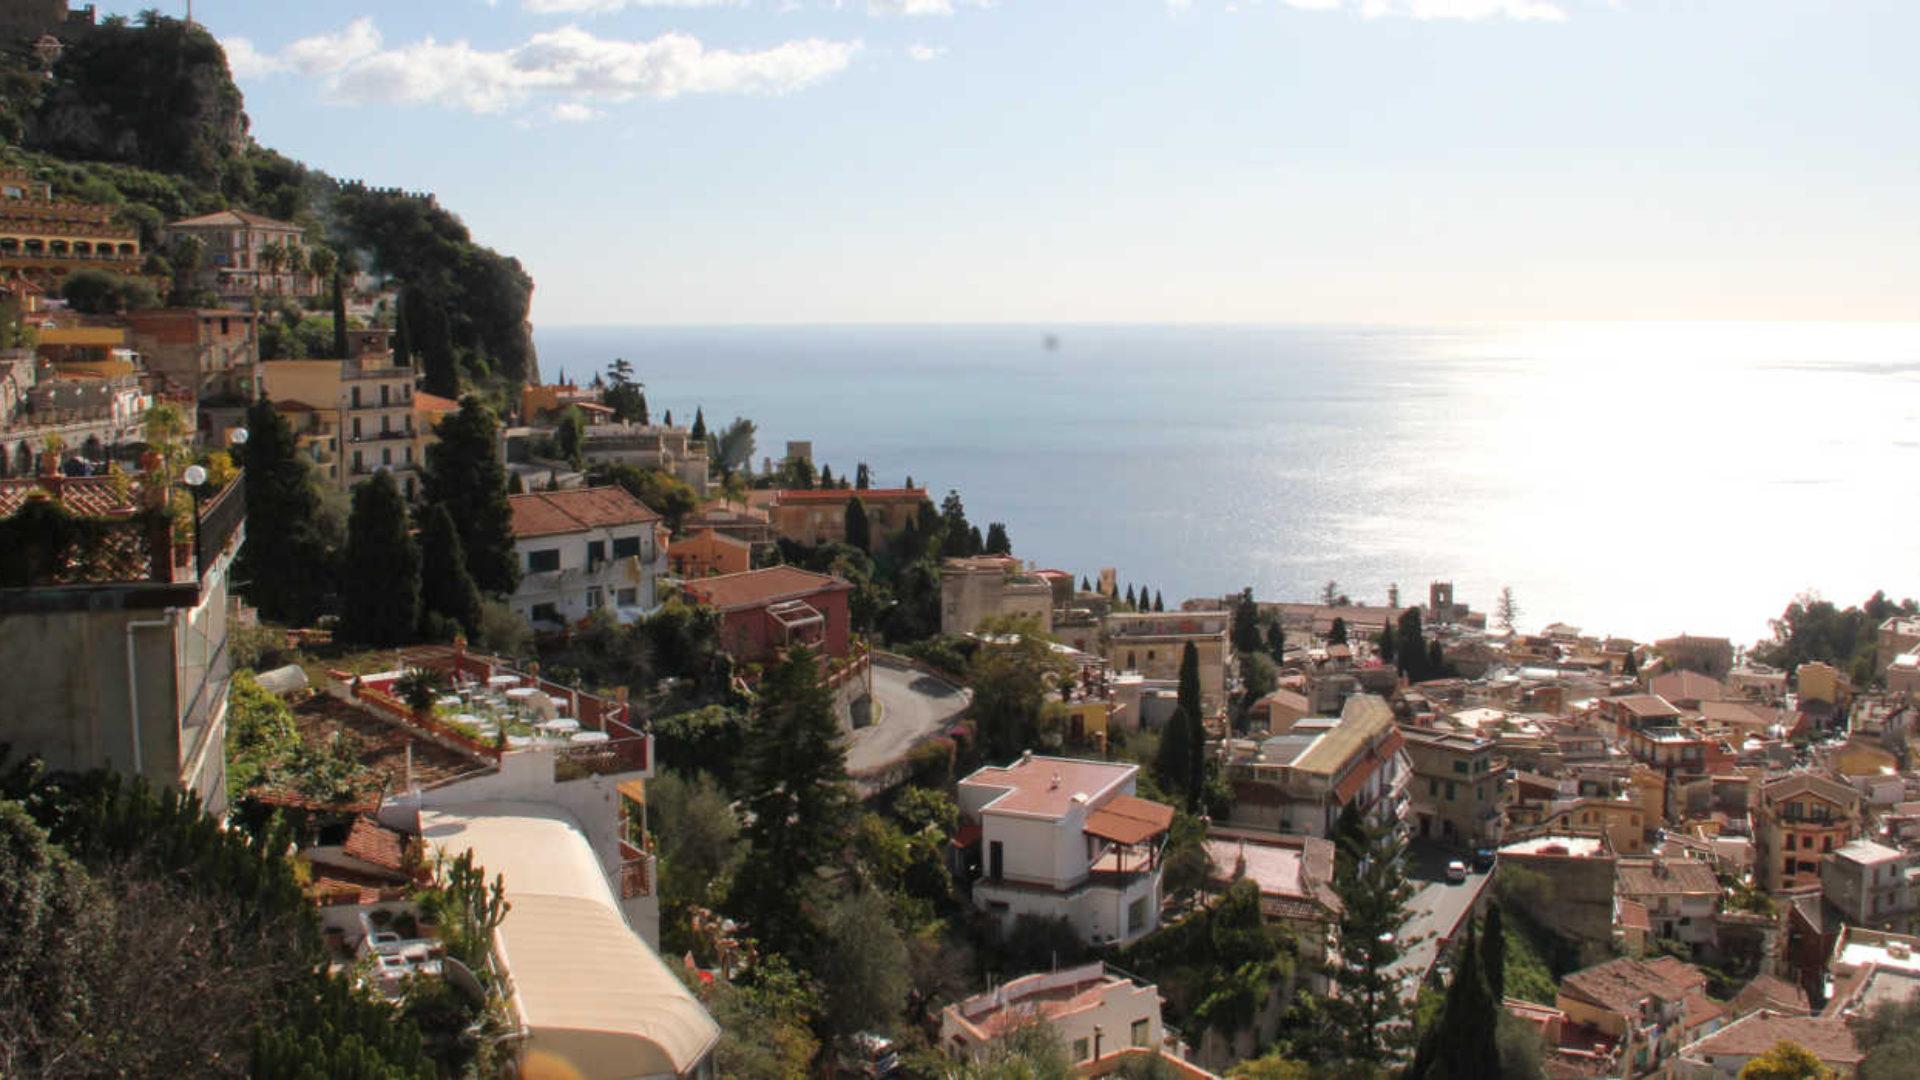 Etna, Taormina, Ionian Sea by bike   FunActive TOURS